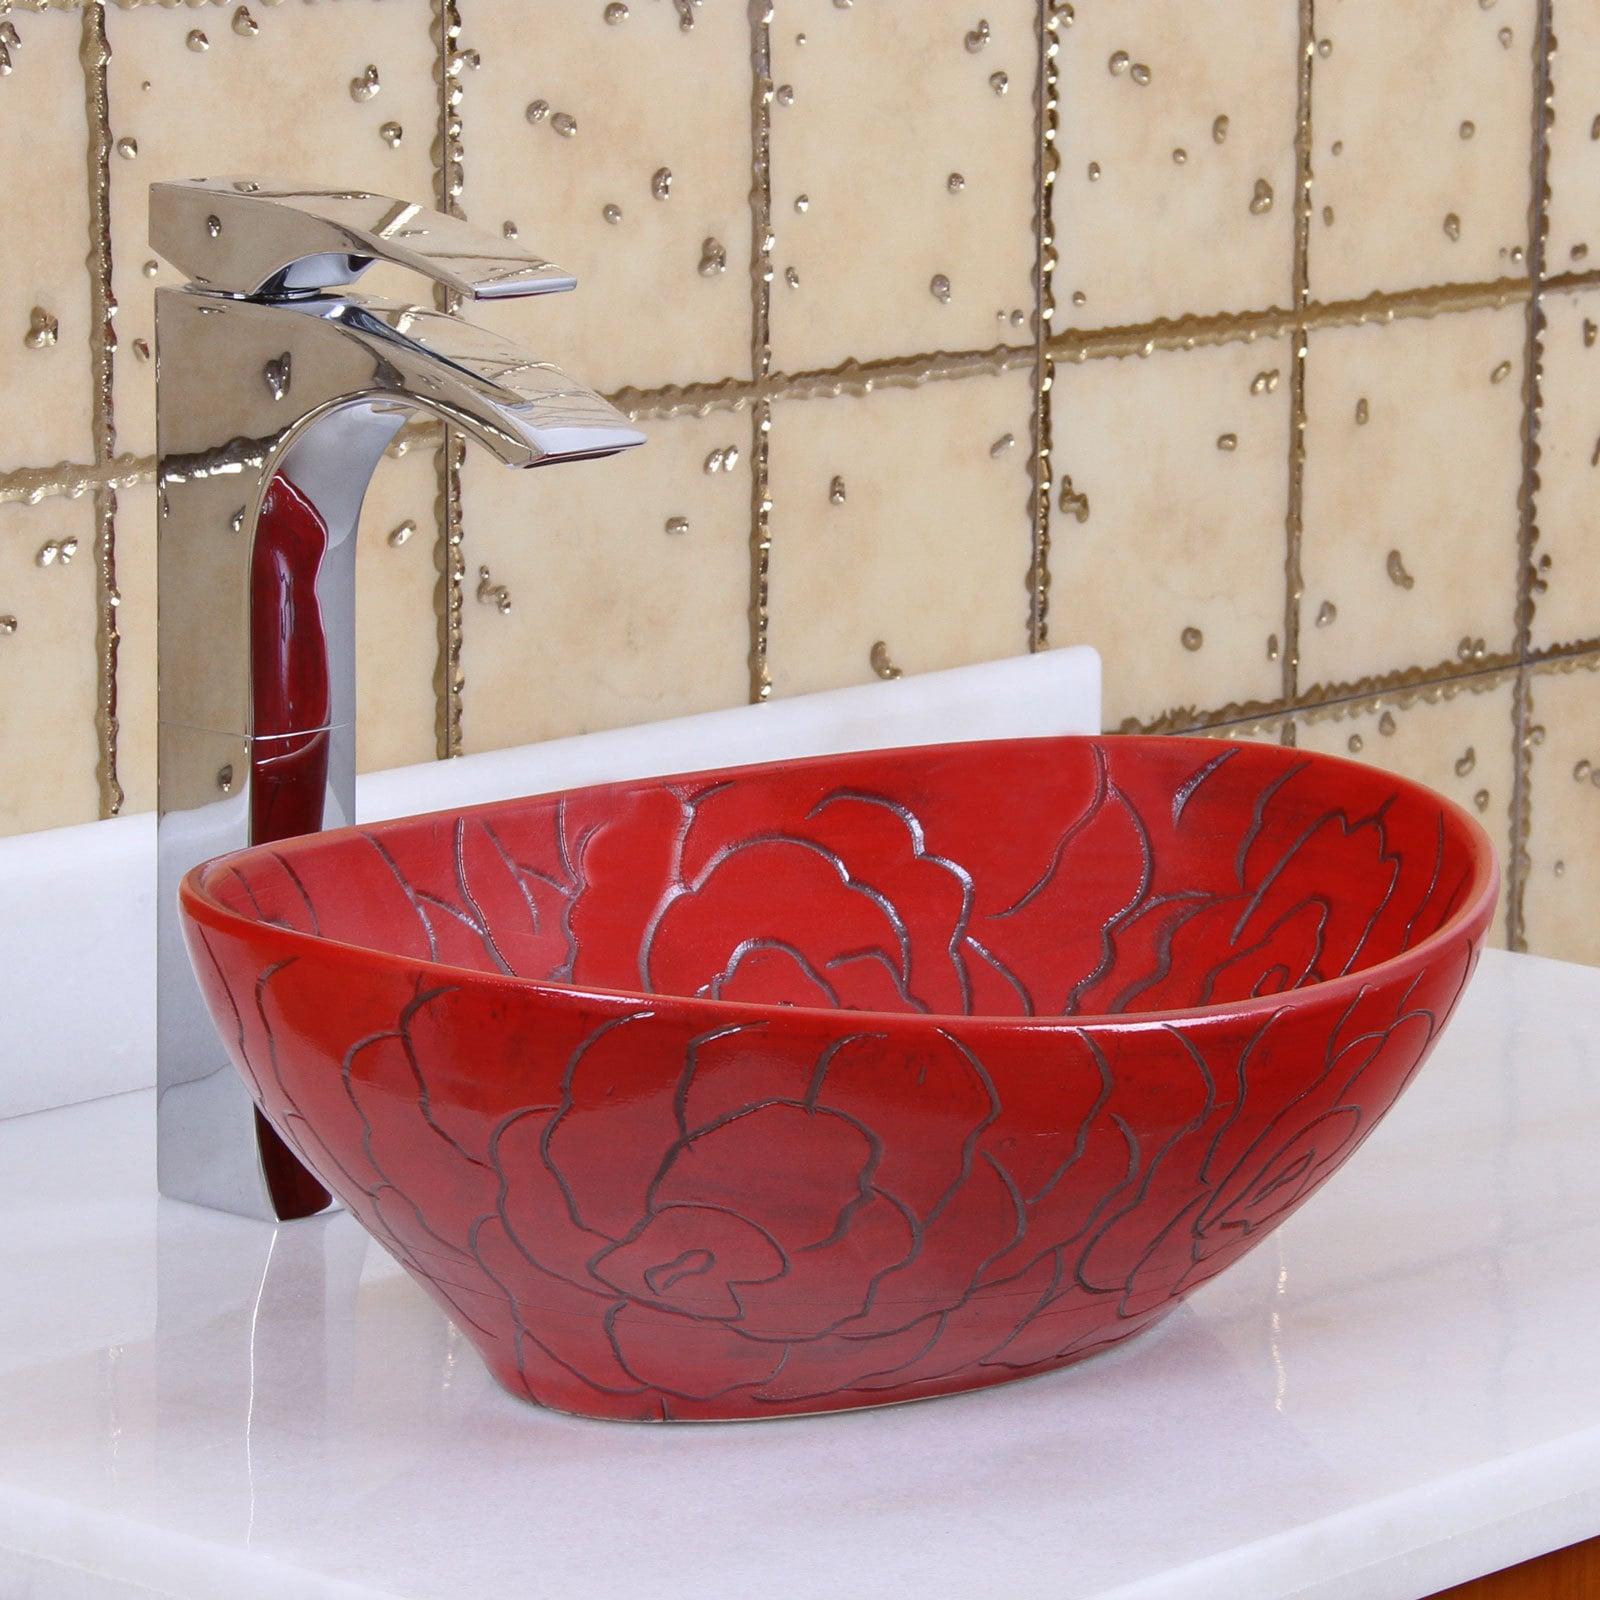 Beau Shop Elite 1557 Oval Red Rose Porcelain Ceramic Bathroom Vessel Sink   Free  Shipping Today   Overstock.com   10421997